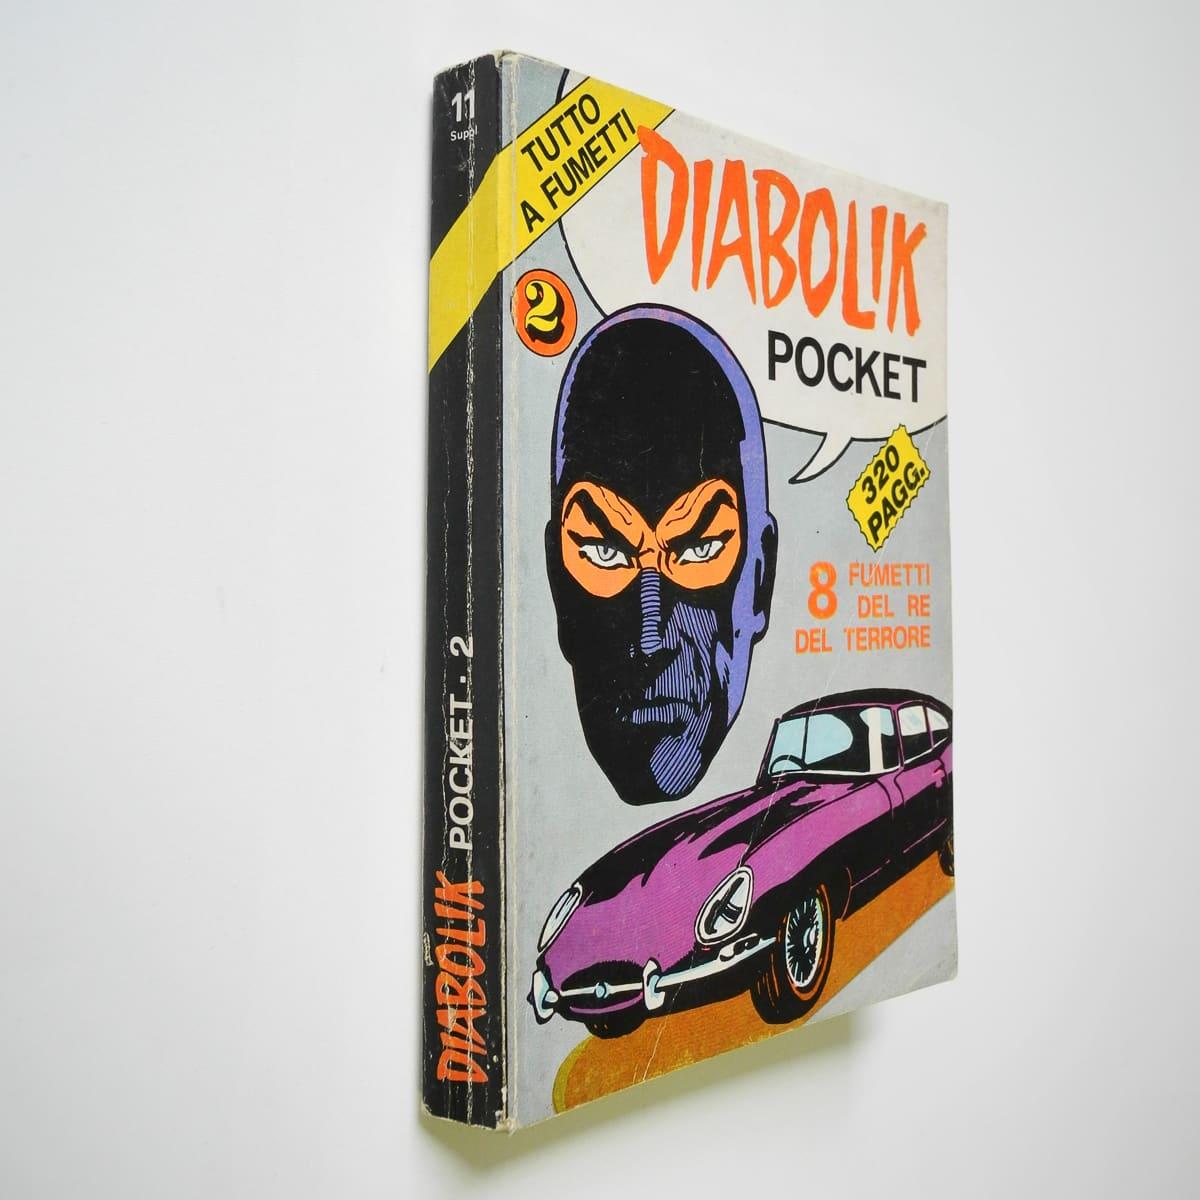 Diabolik Pocket n. 2 Sansoni